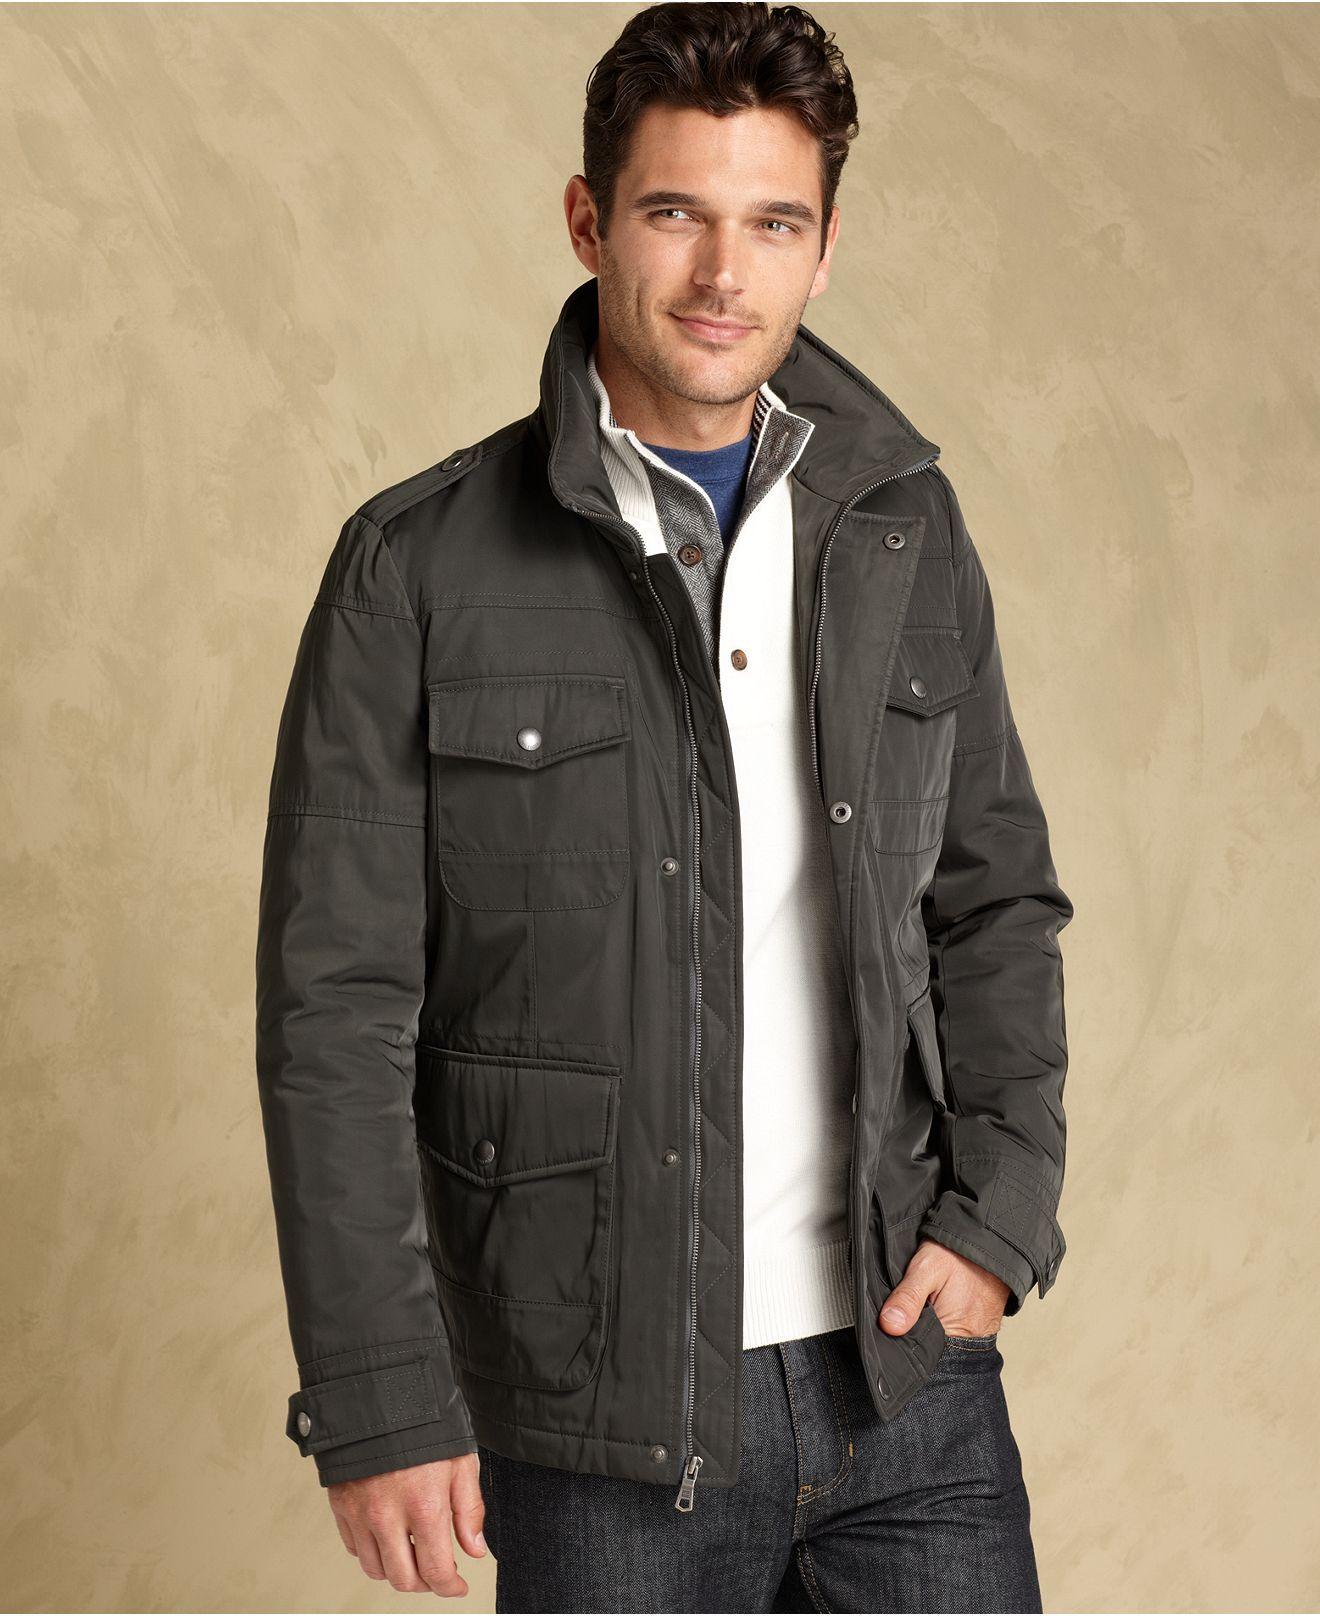 Tommy Hilfiger Jacket Four Pocket Field Jacket Mens Coats Jackets Macy S Mens Jackets Tommy Hilfiger Jackets Mens Coats [ 1616 x 1320 Pixel ]